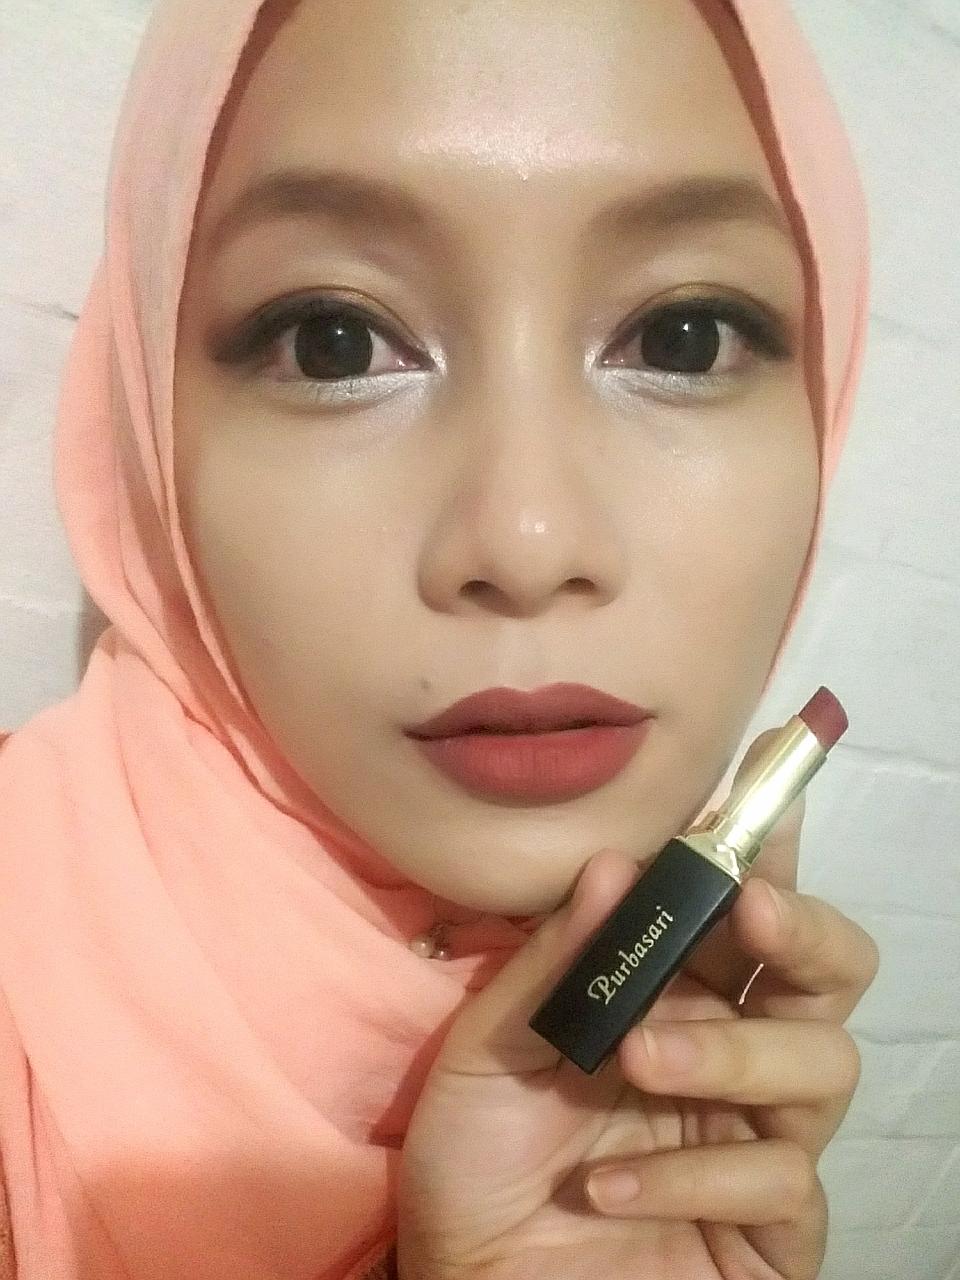 Lipstik Purbasari No 86 Collor Matte Bancidandan Review Lipstick Color